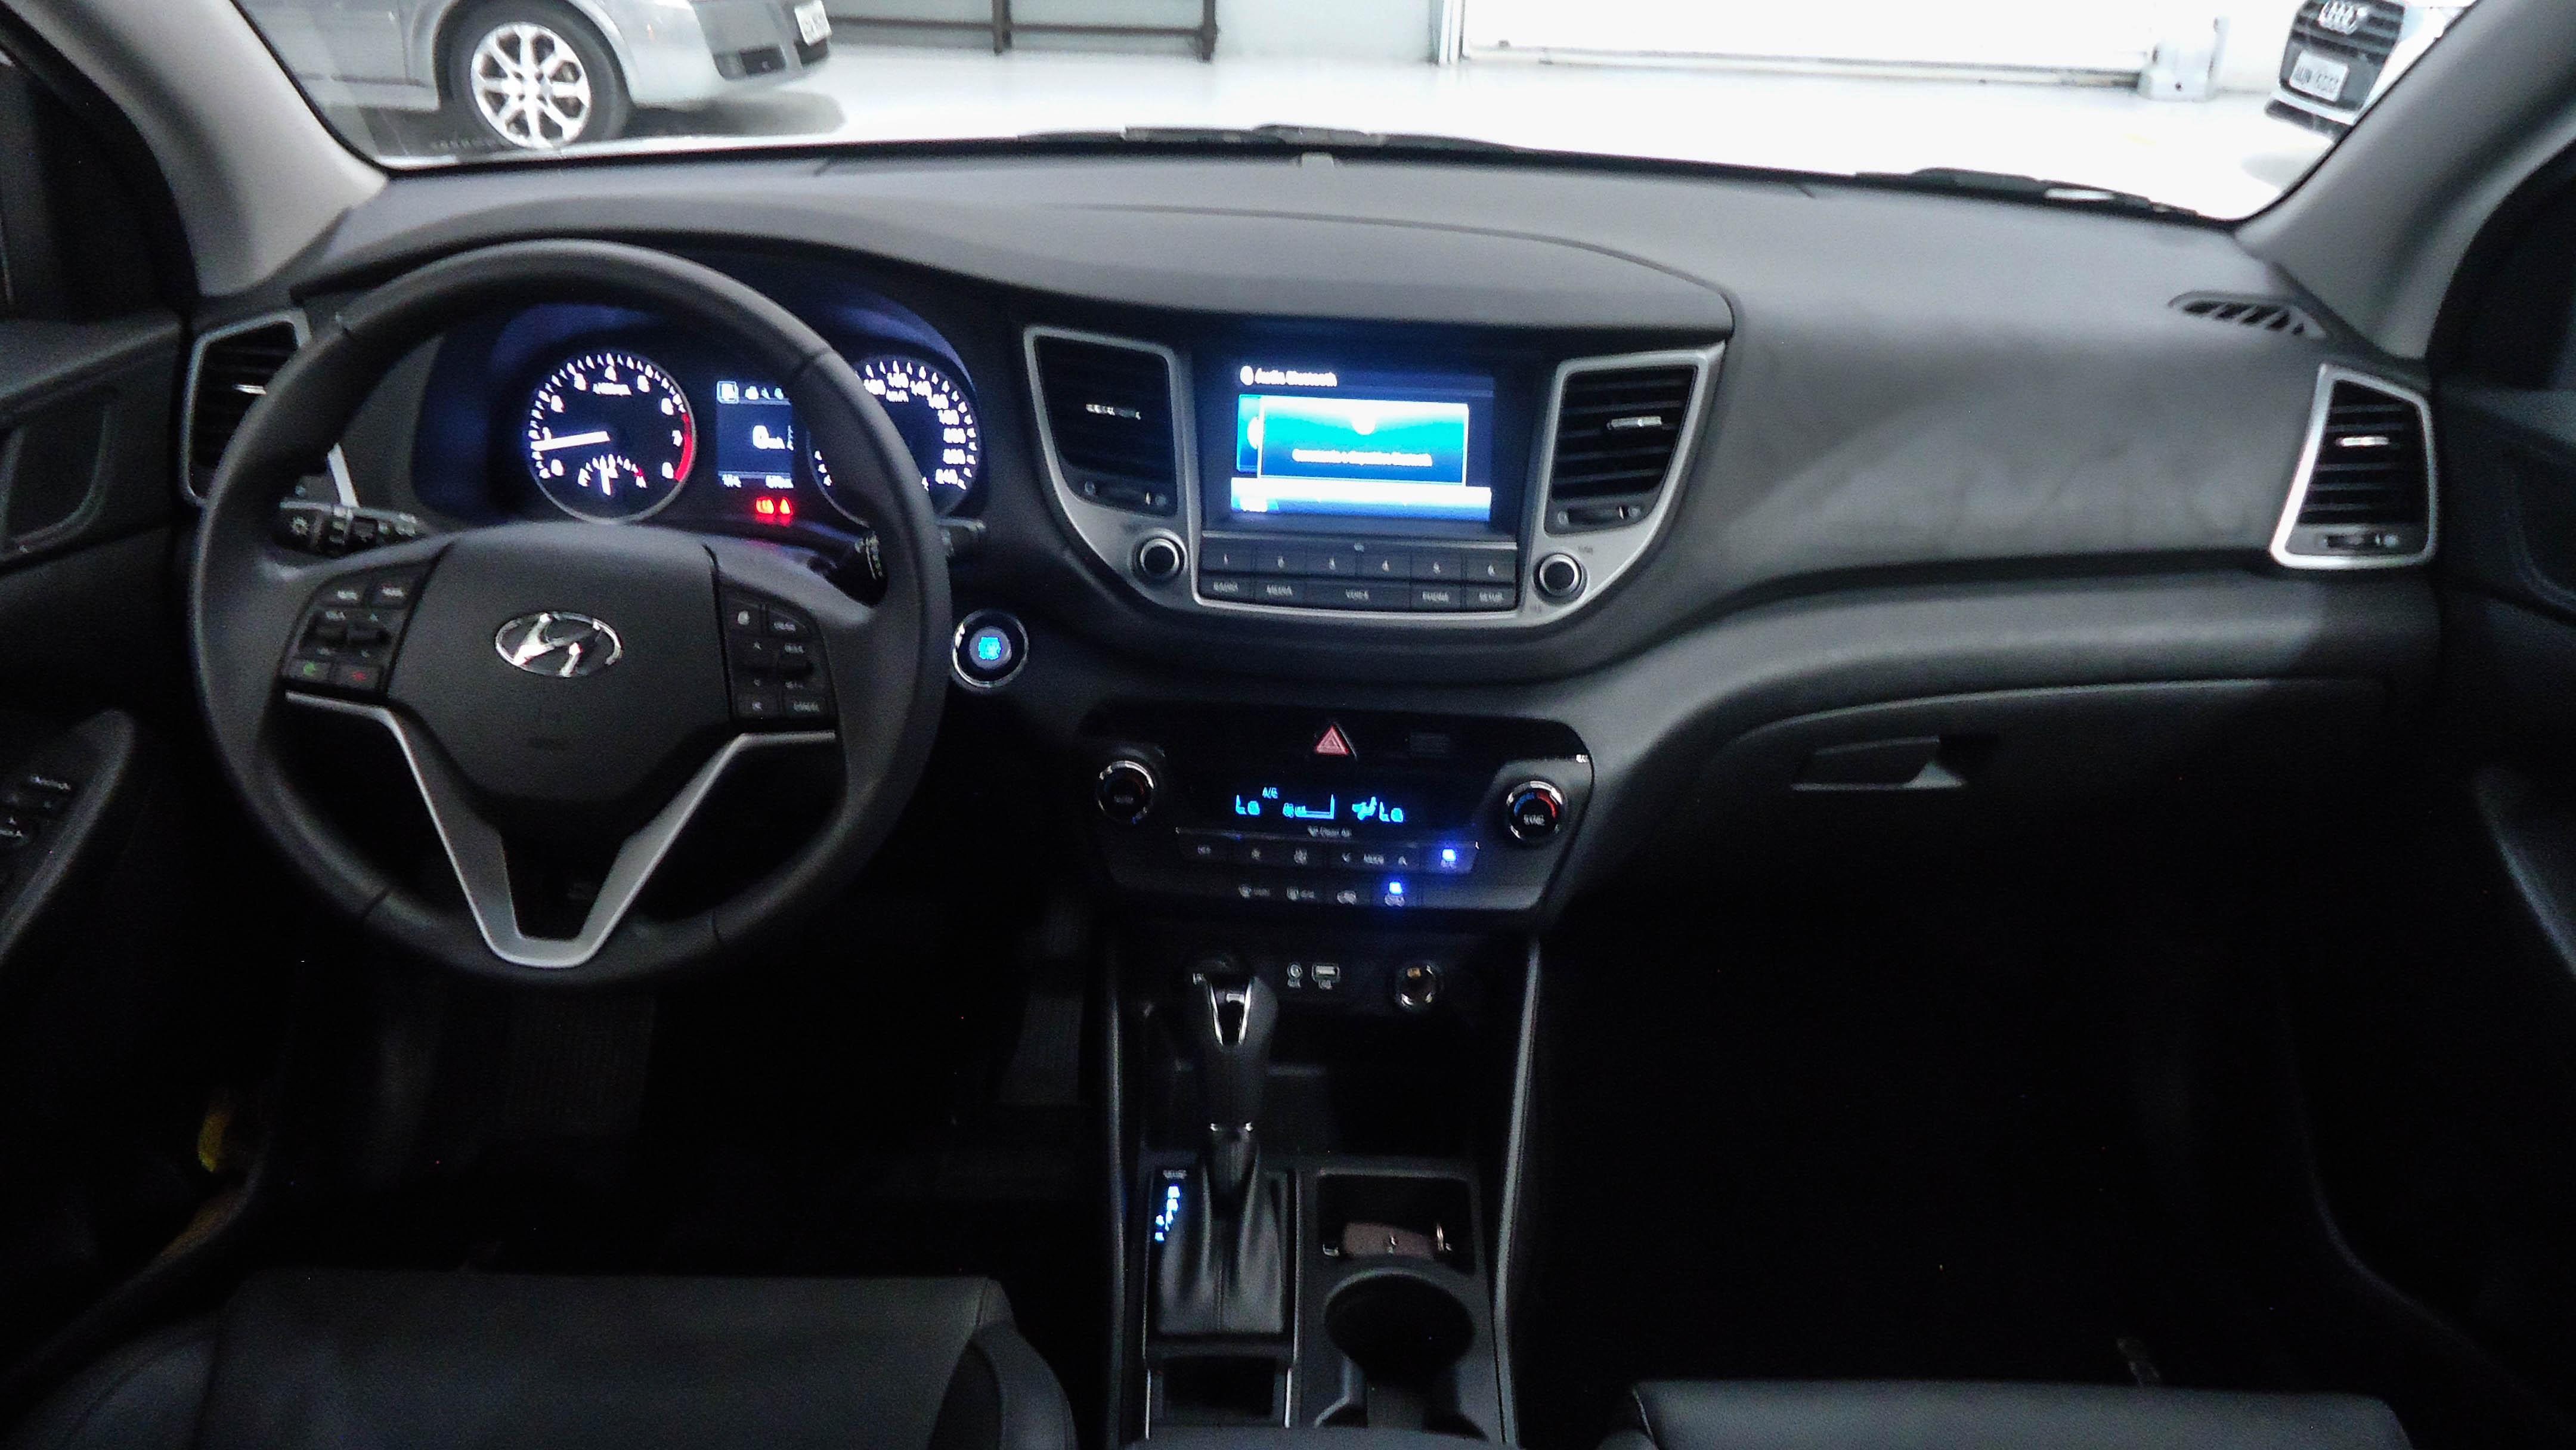 New Tucson 2018 >> هيونداى توسان 2018 Hyundai Tucson اسعار وعيوب ومميزات ومواصفات وصور | برامجنا